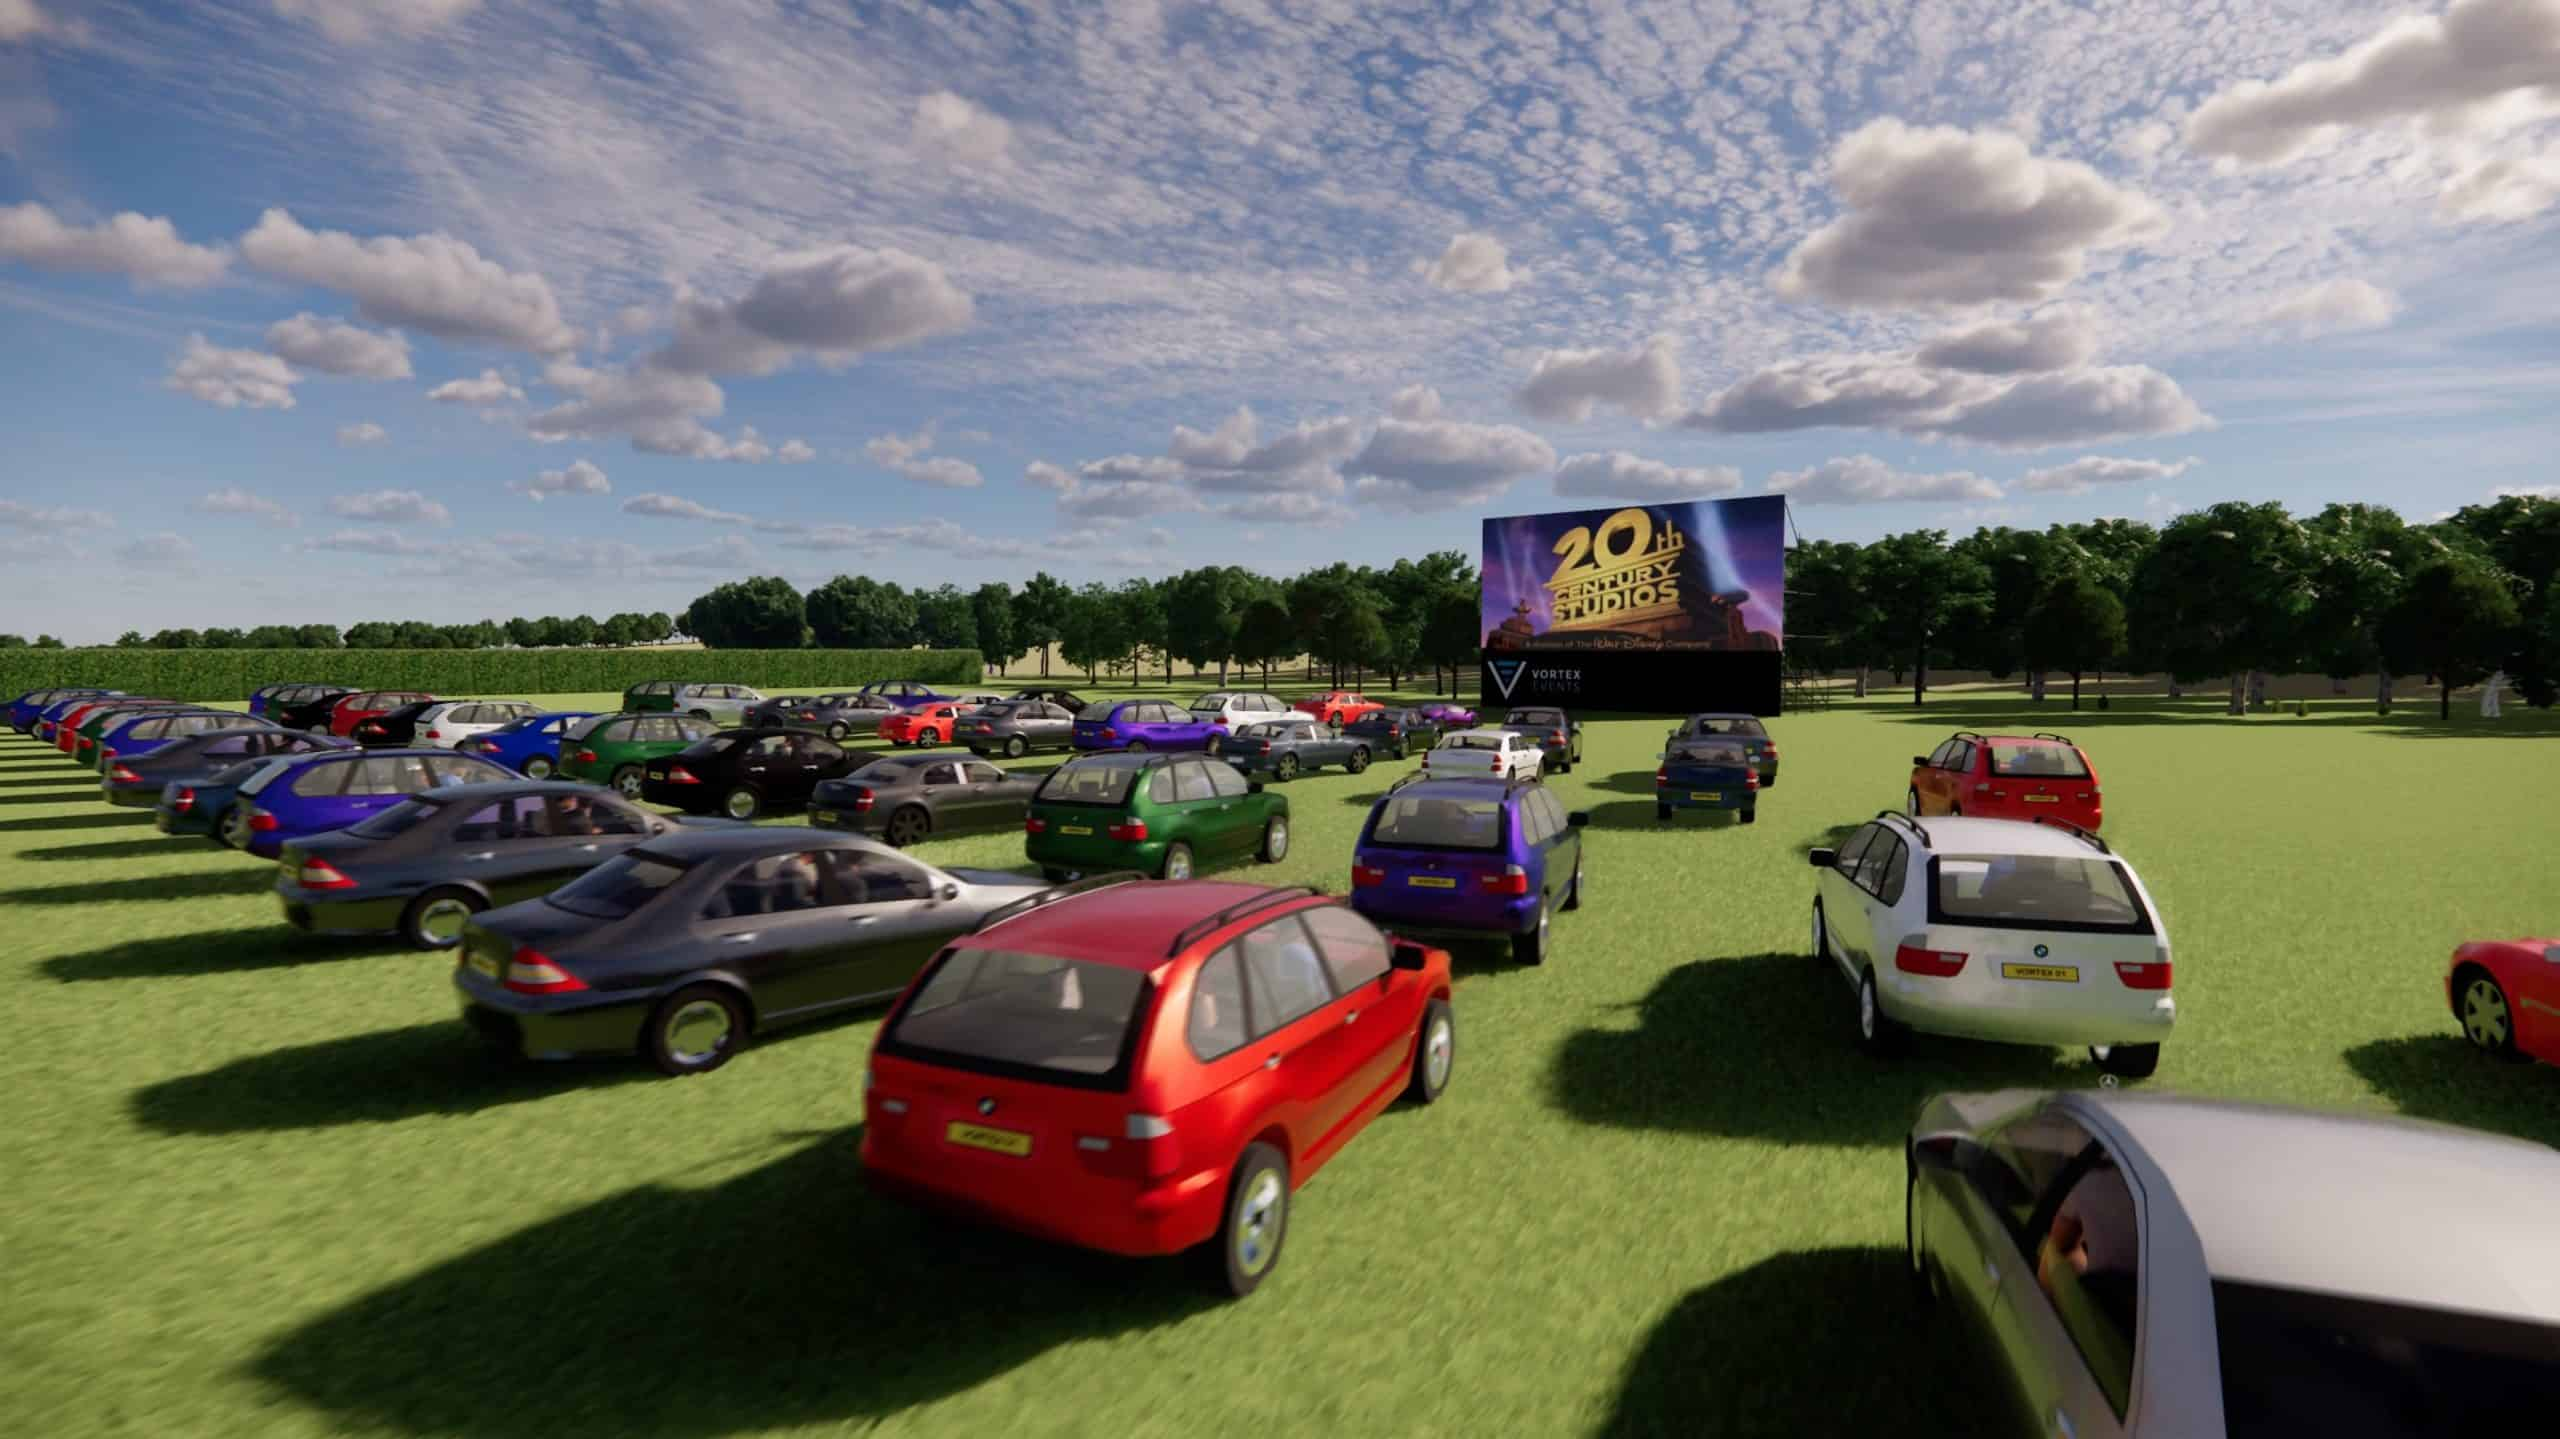 Drive in Cinema LED Screen hire